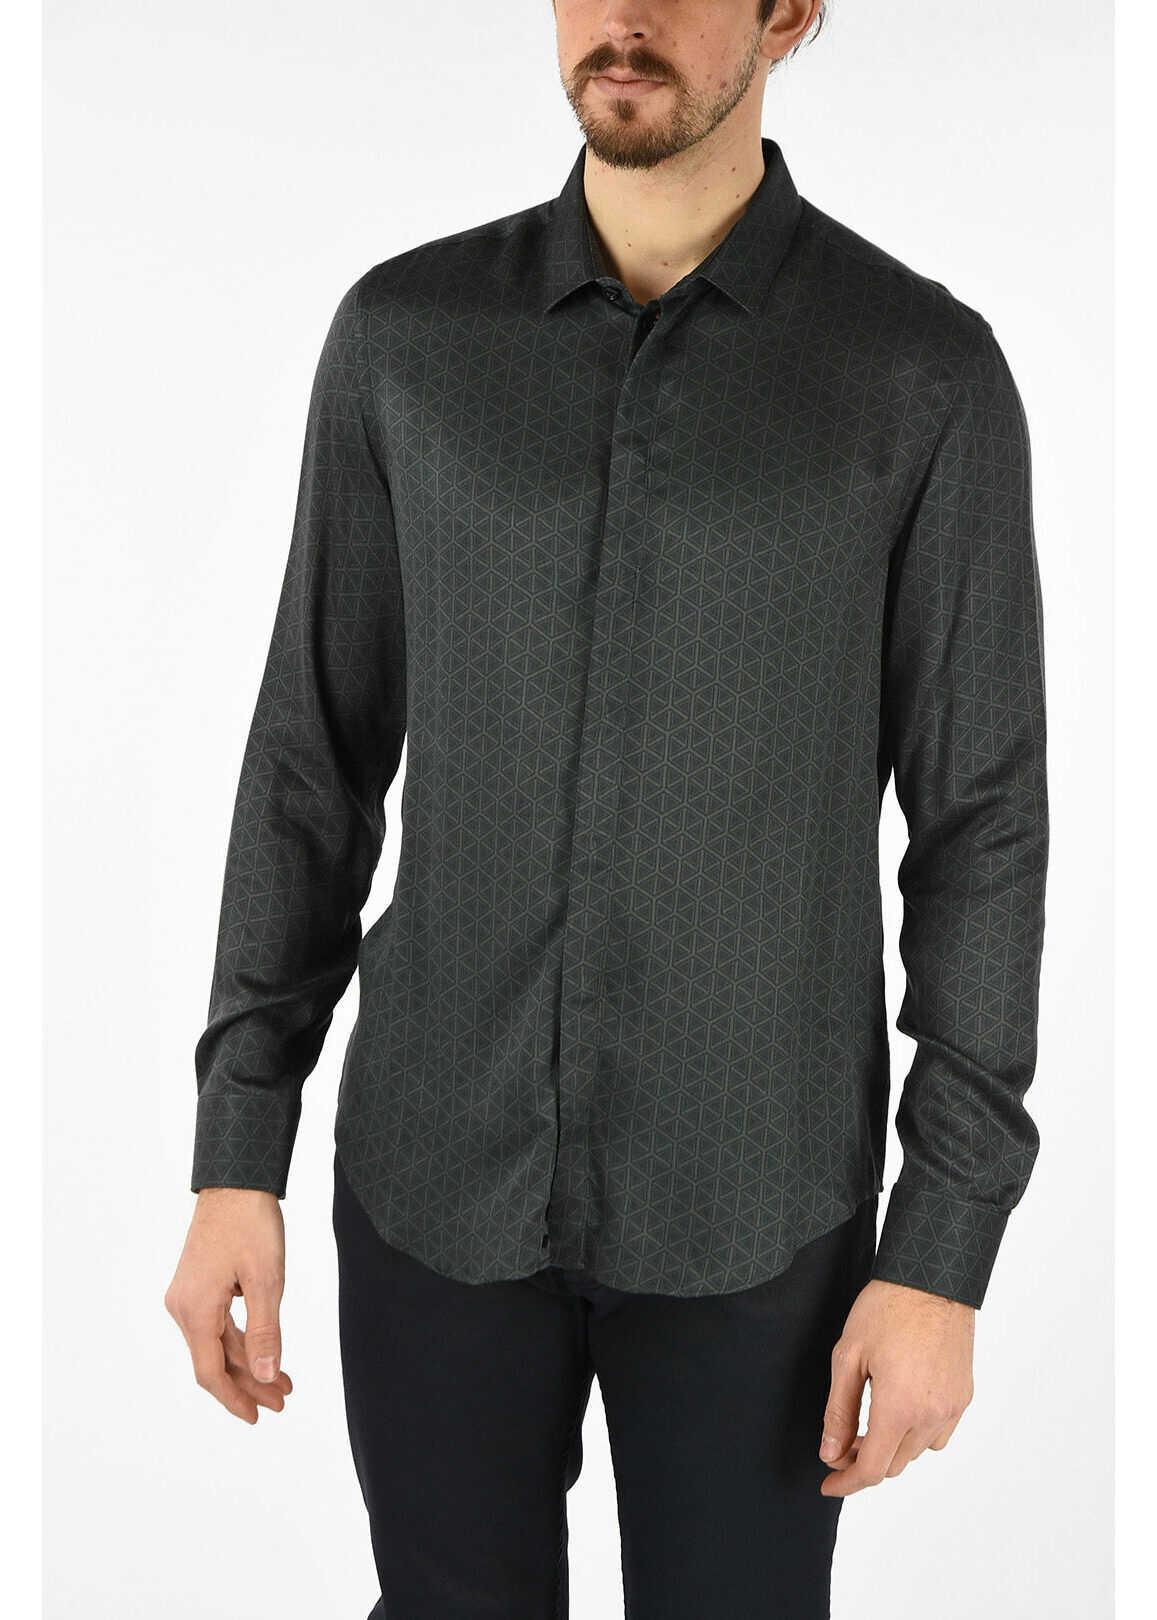 Armani EMPORIO Printed Shirt GRAY